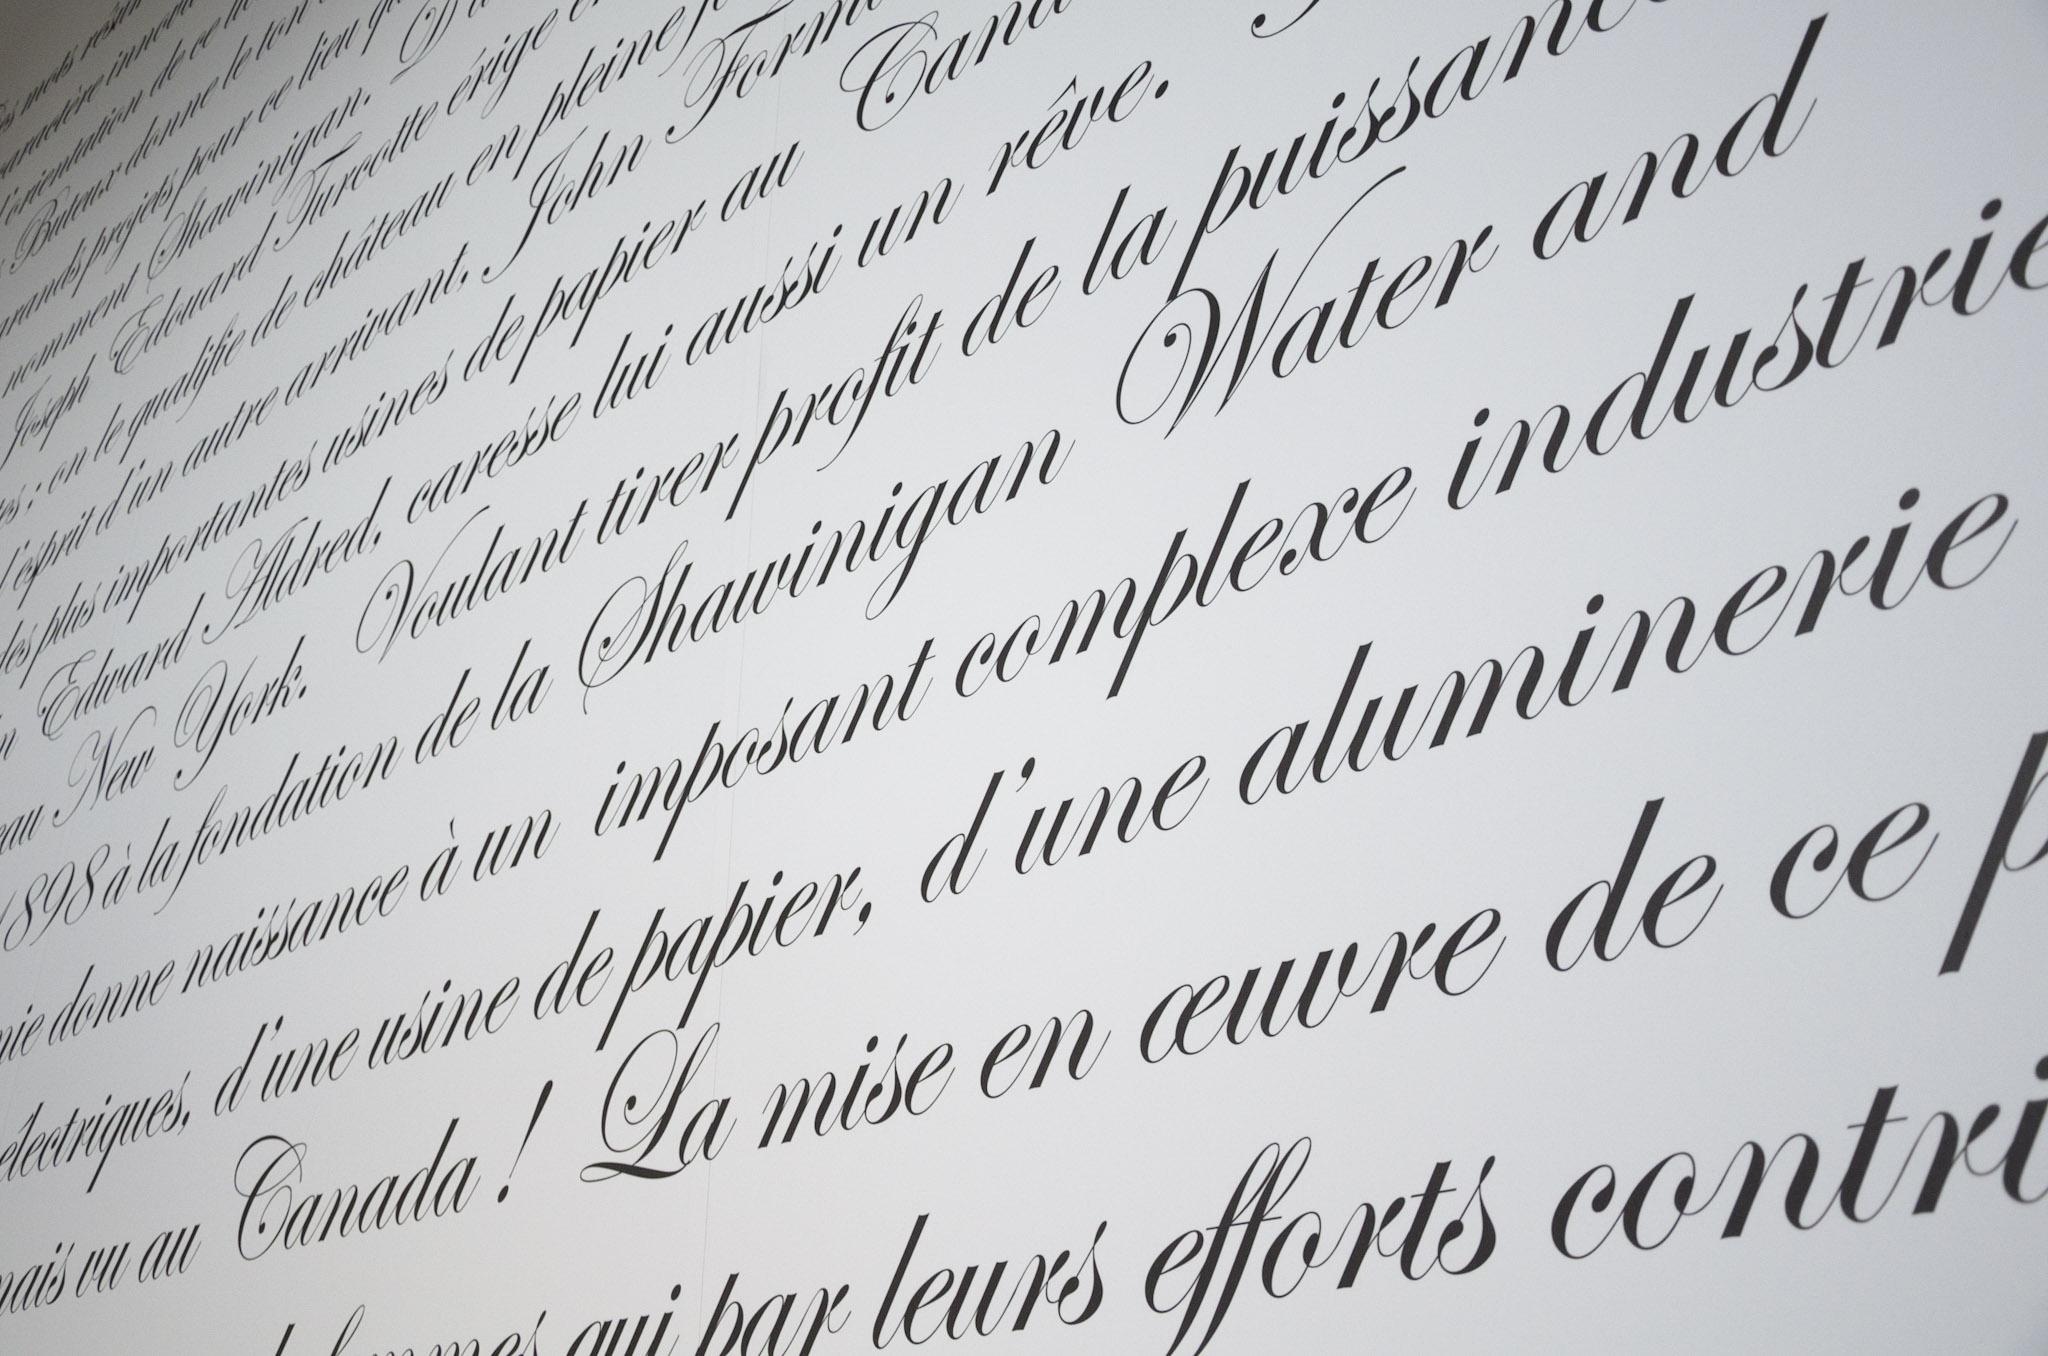 Texte hommage de M. Mario Lachance.